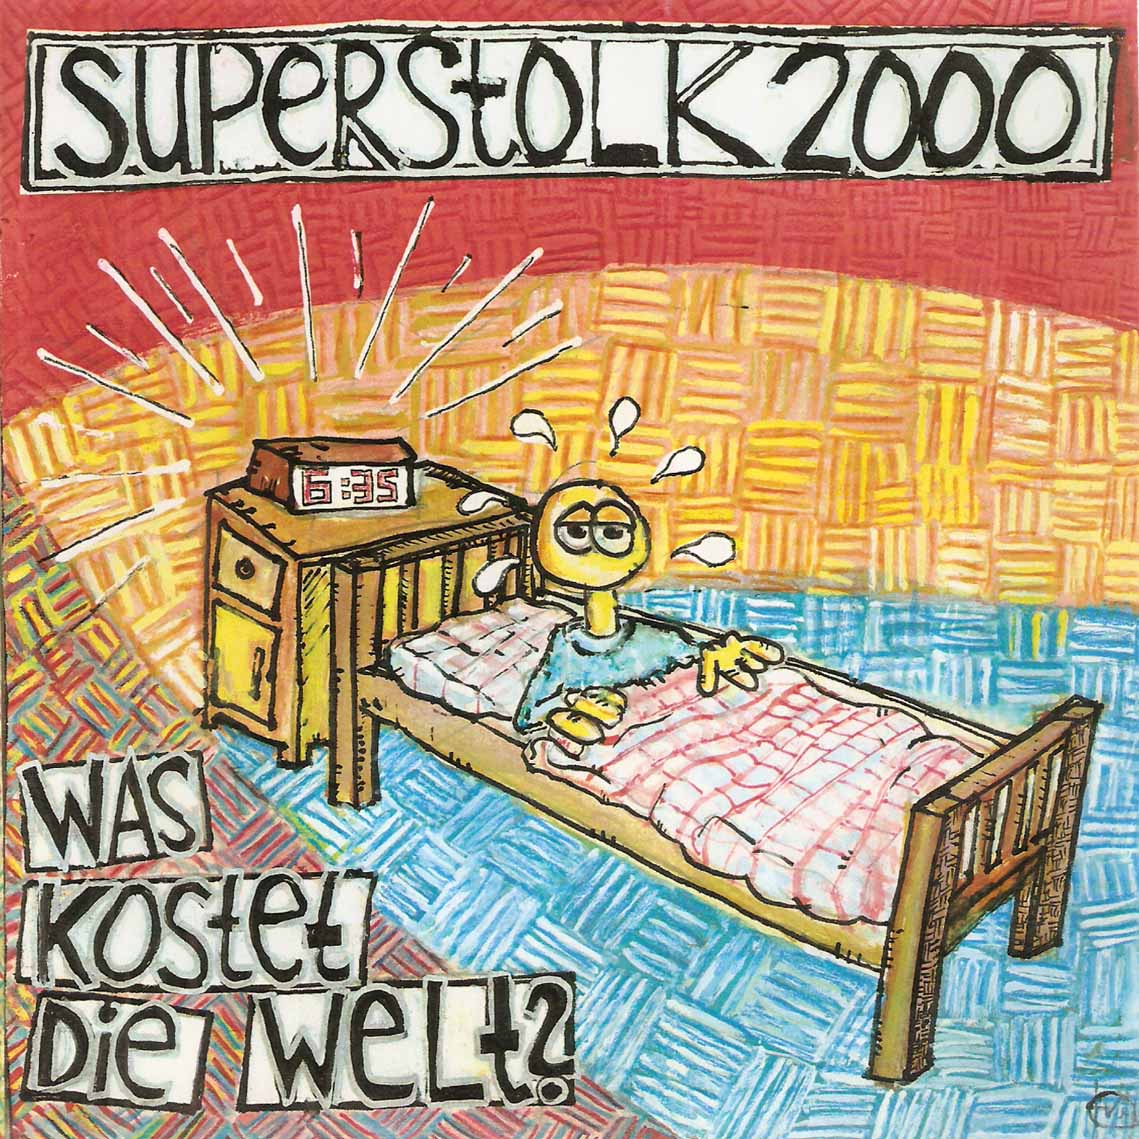 whydothingshavetochange superstolk 2000 was kostet die welt ep 1997. Black Bedroom Furniture Sets. Home Design Ideas